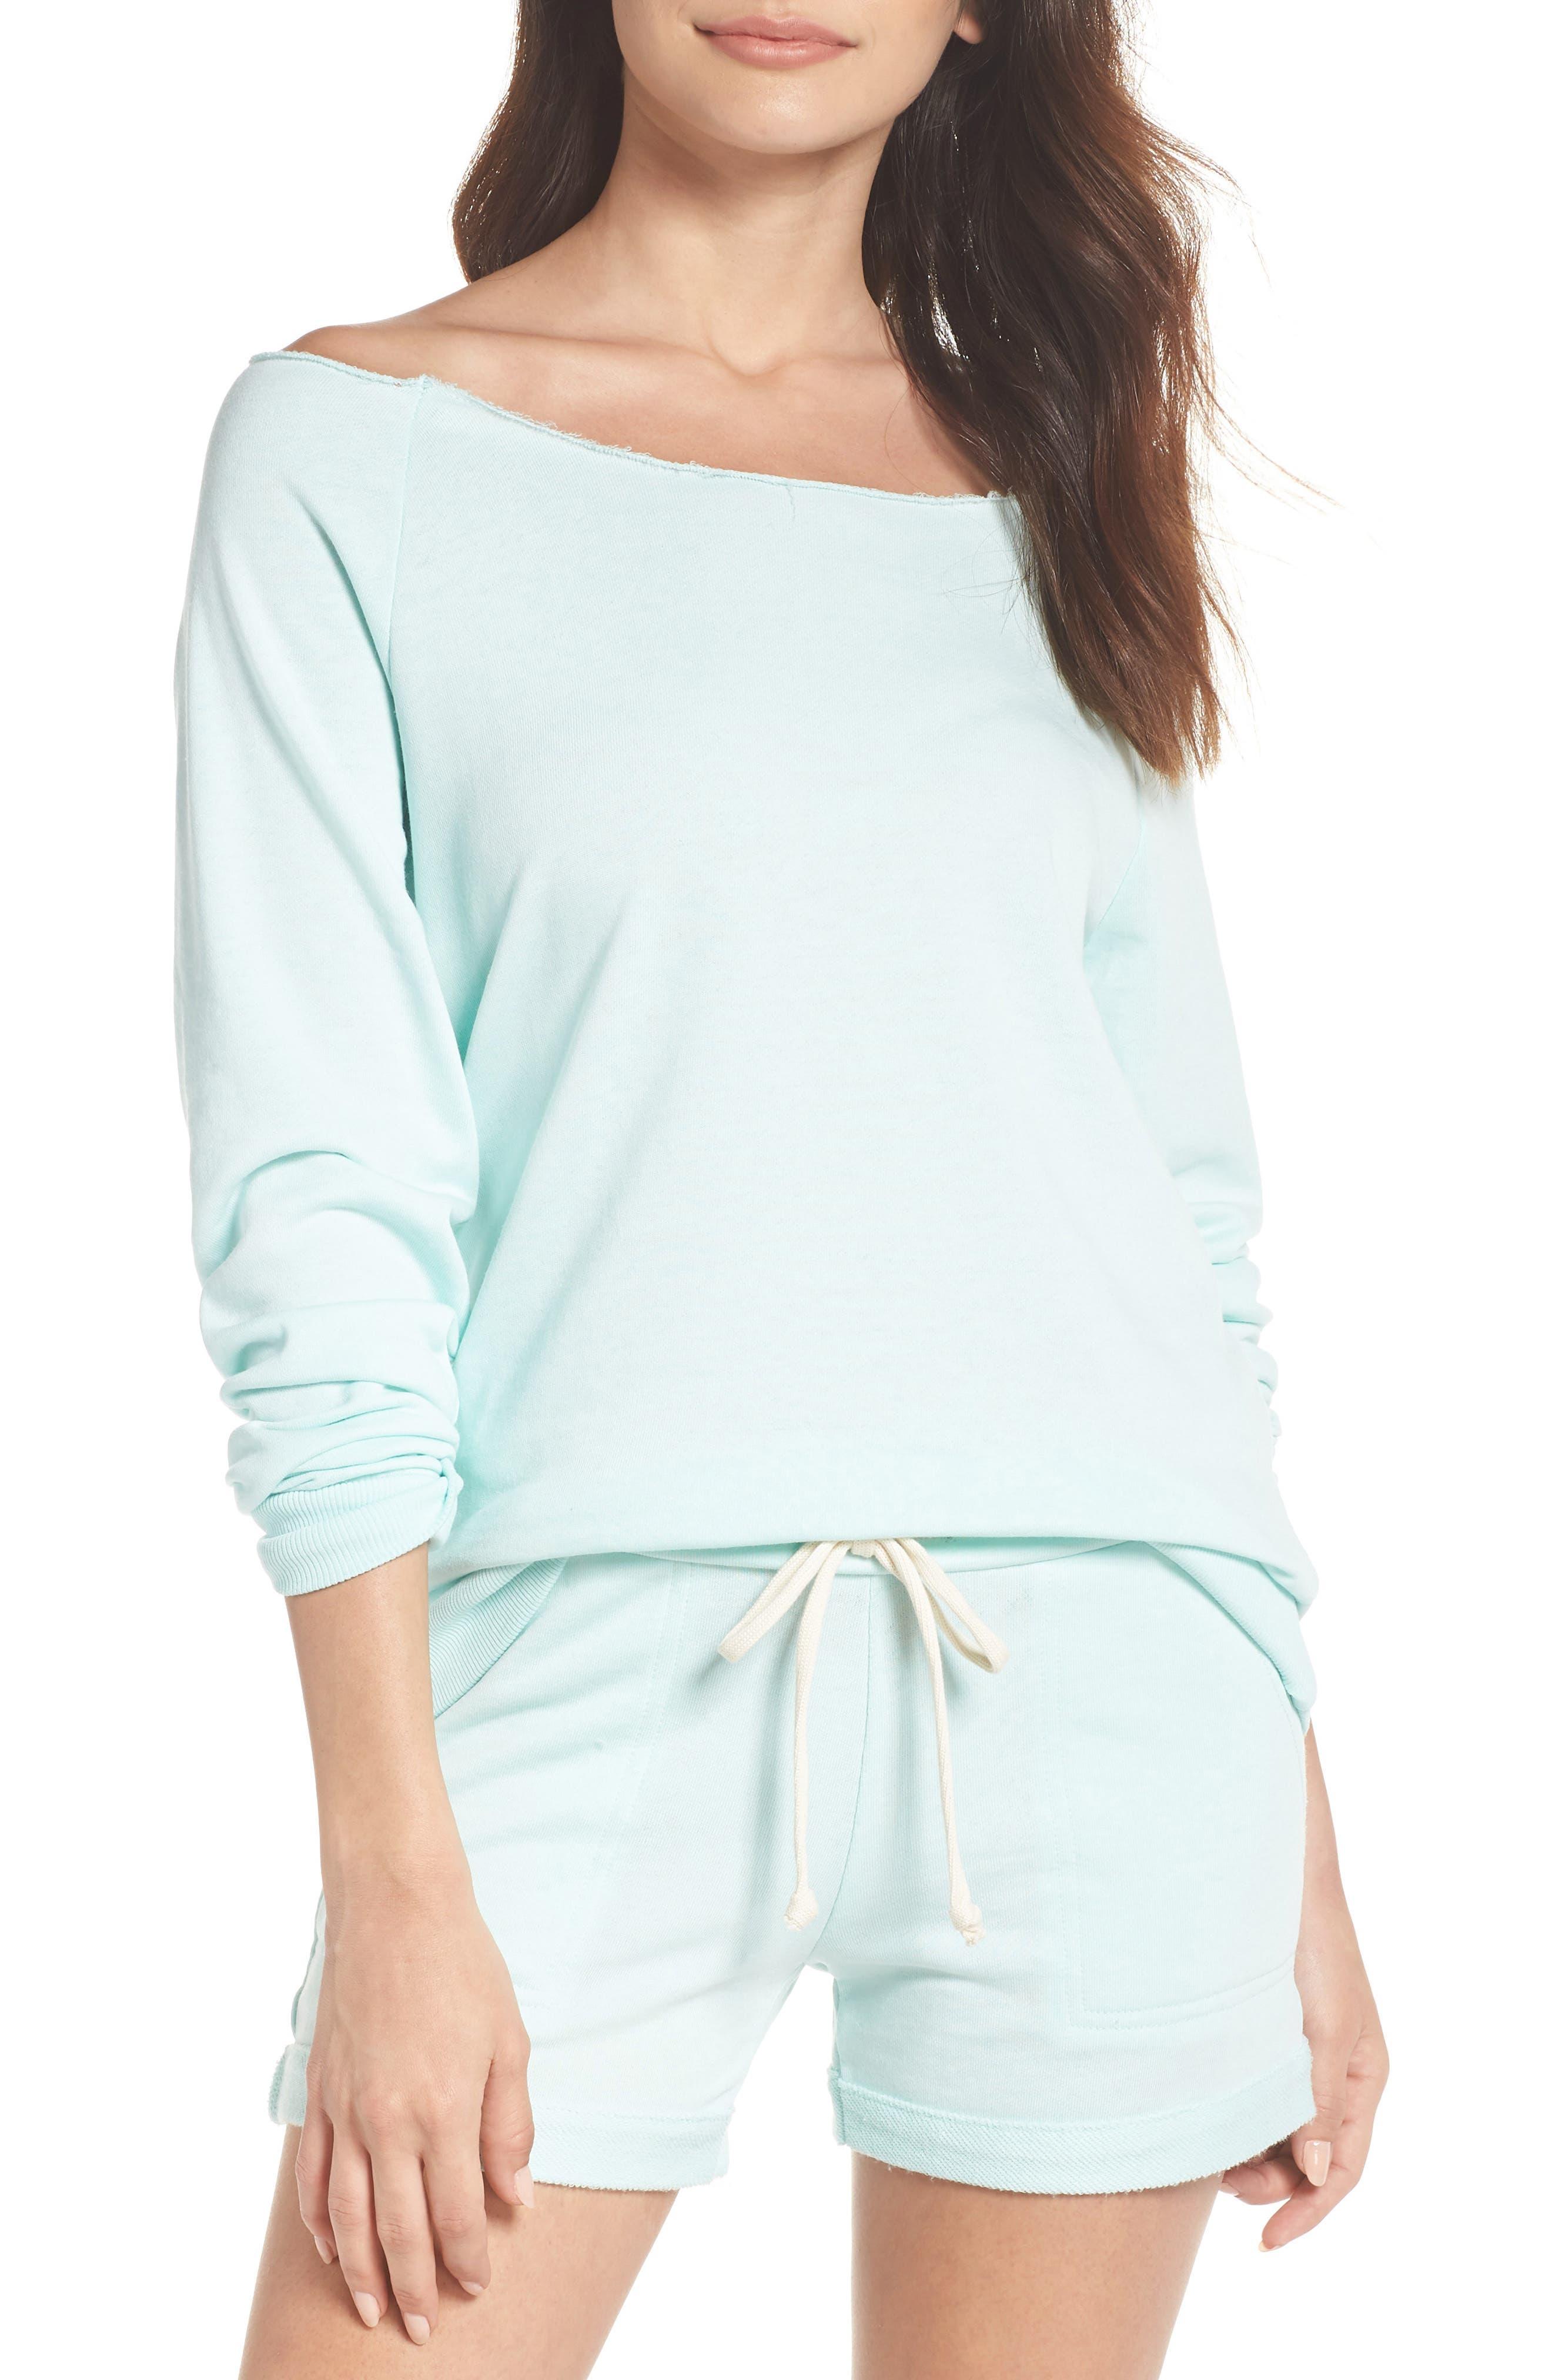 Maniac French Terry Sweatshirt,                         Main,                         color, 300